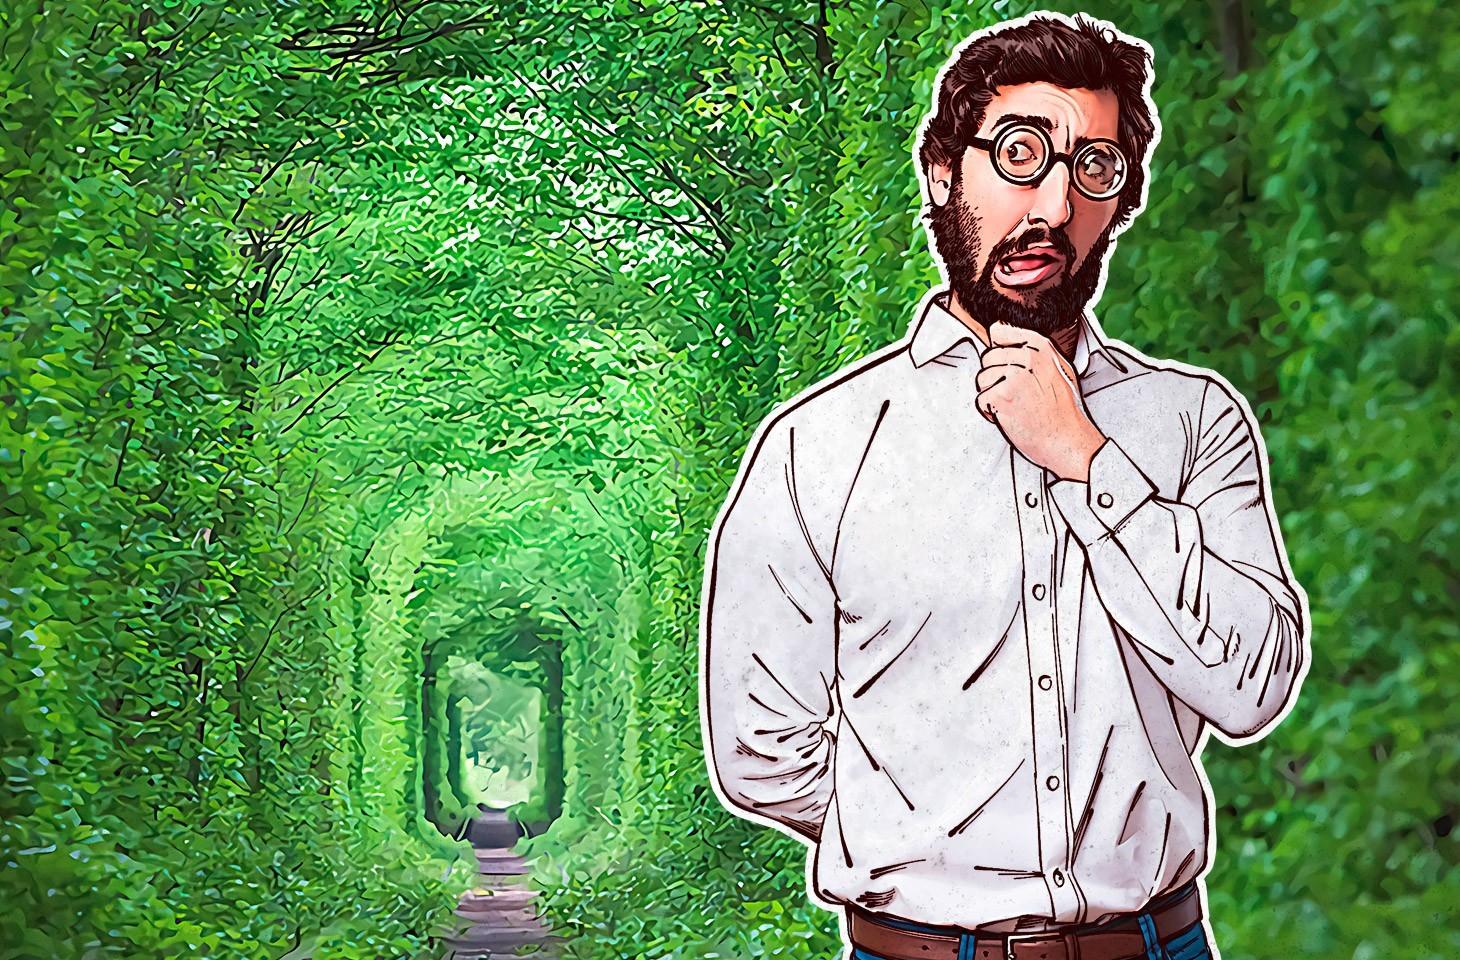 1493813304 kaspersky comment bien choisir un vpn - Kaspersky: Comment bien choisir un VPN